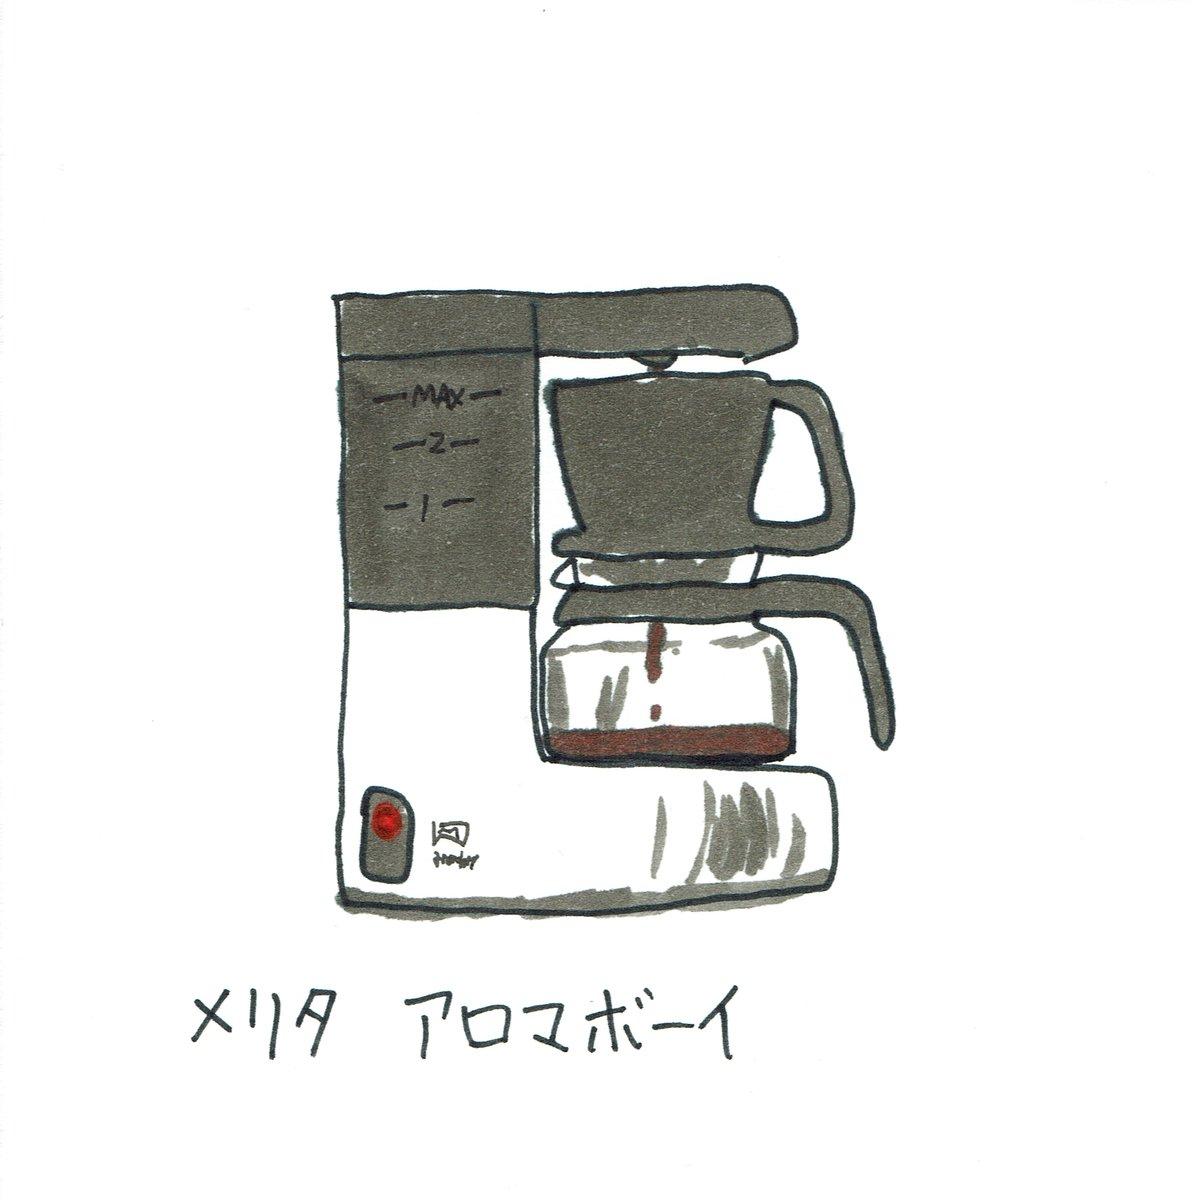 pixivに投稿しました コーヒーメーカー #pixiv https://www.pixiv.net/member_illust.php?illust_id=68682572&mode=medium  … 落ち着いたデザインで、おいしい。 ...